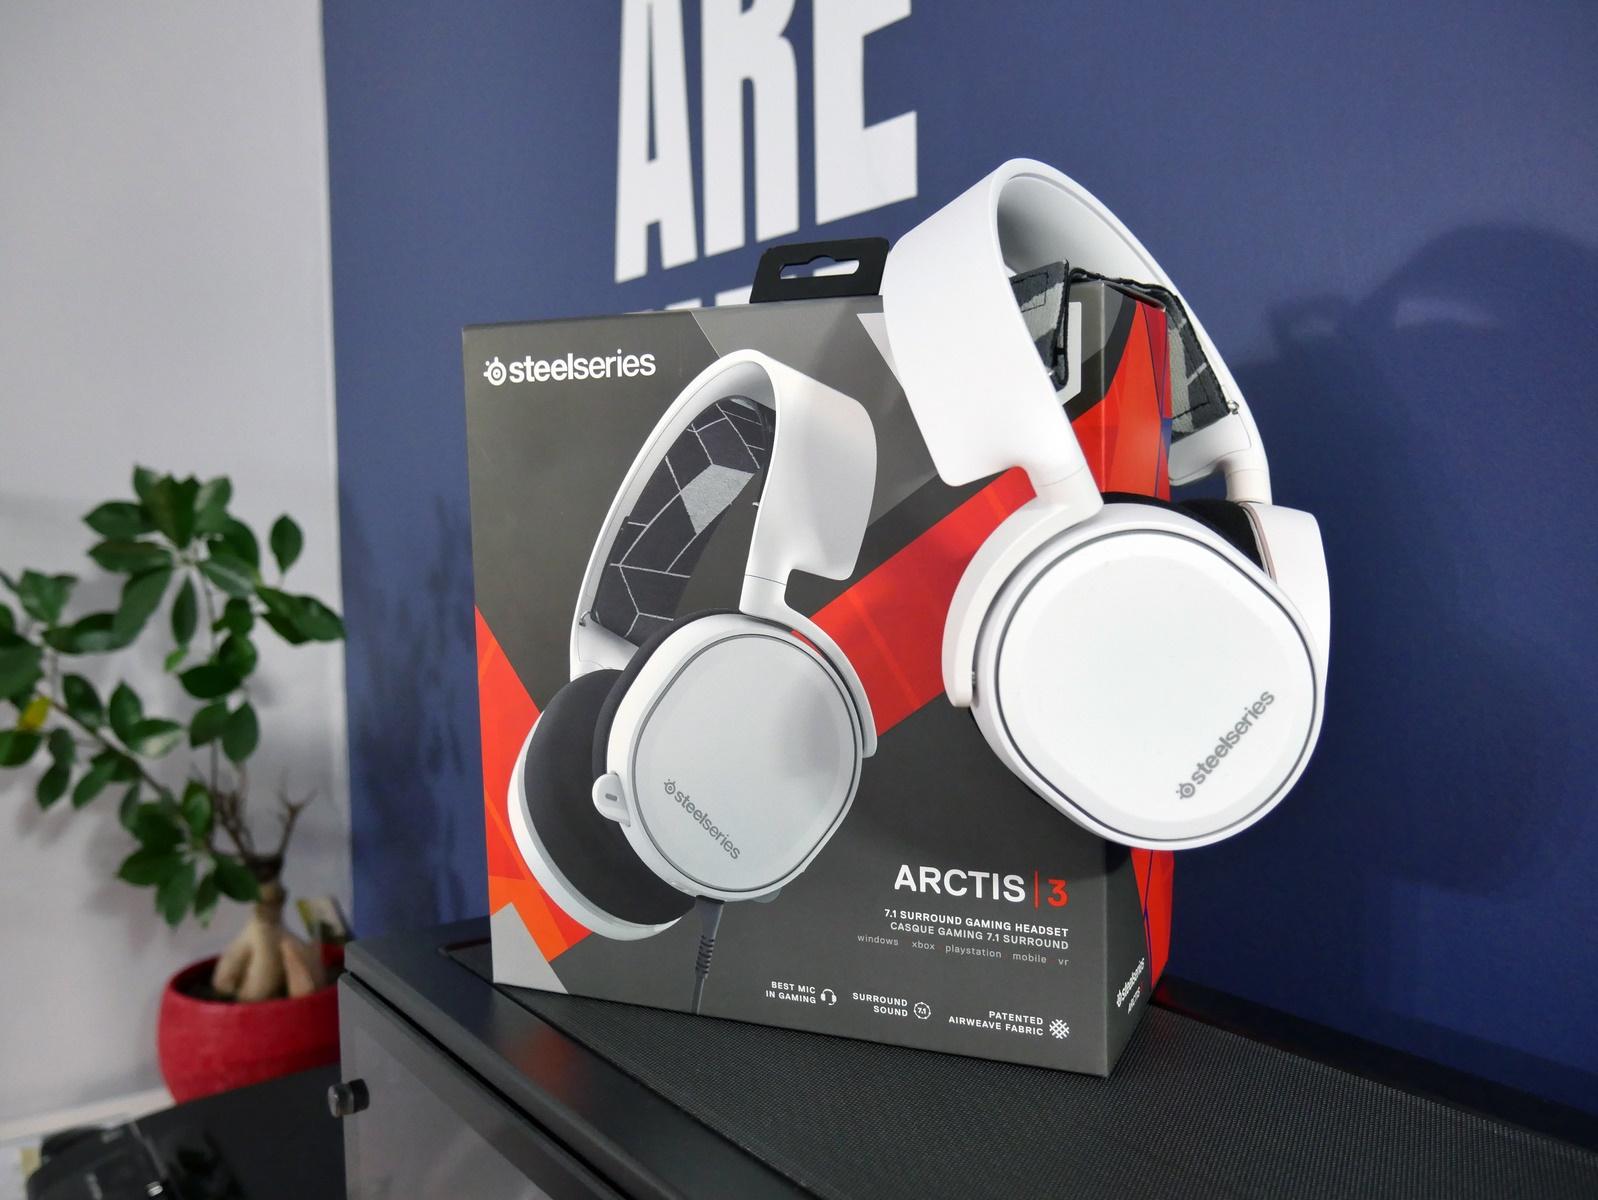 steelseries-arctis-3-recenzja-14